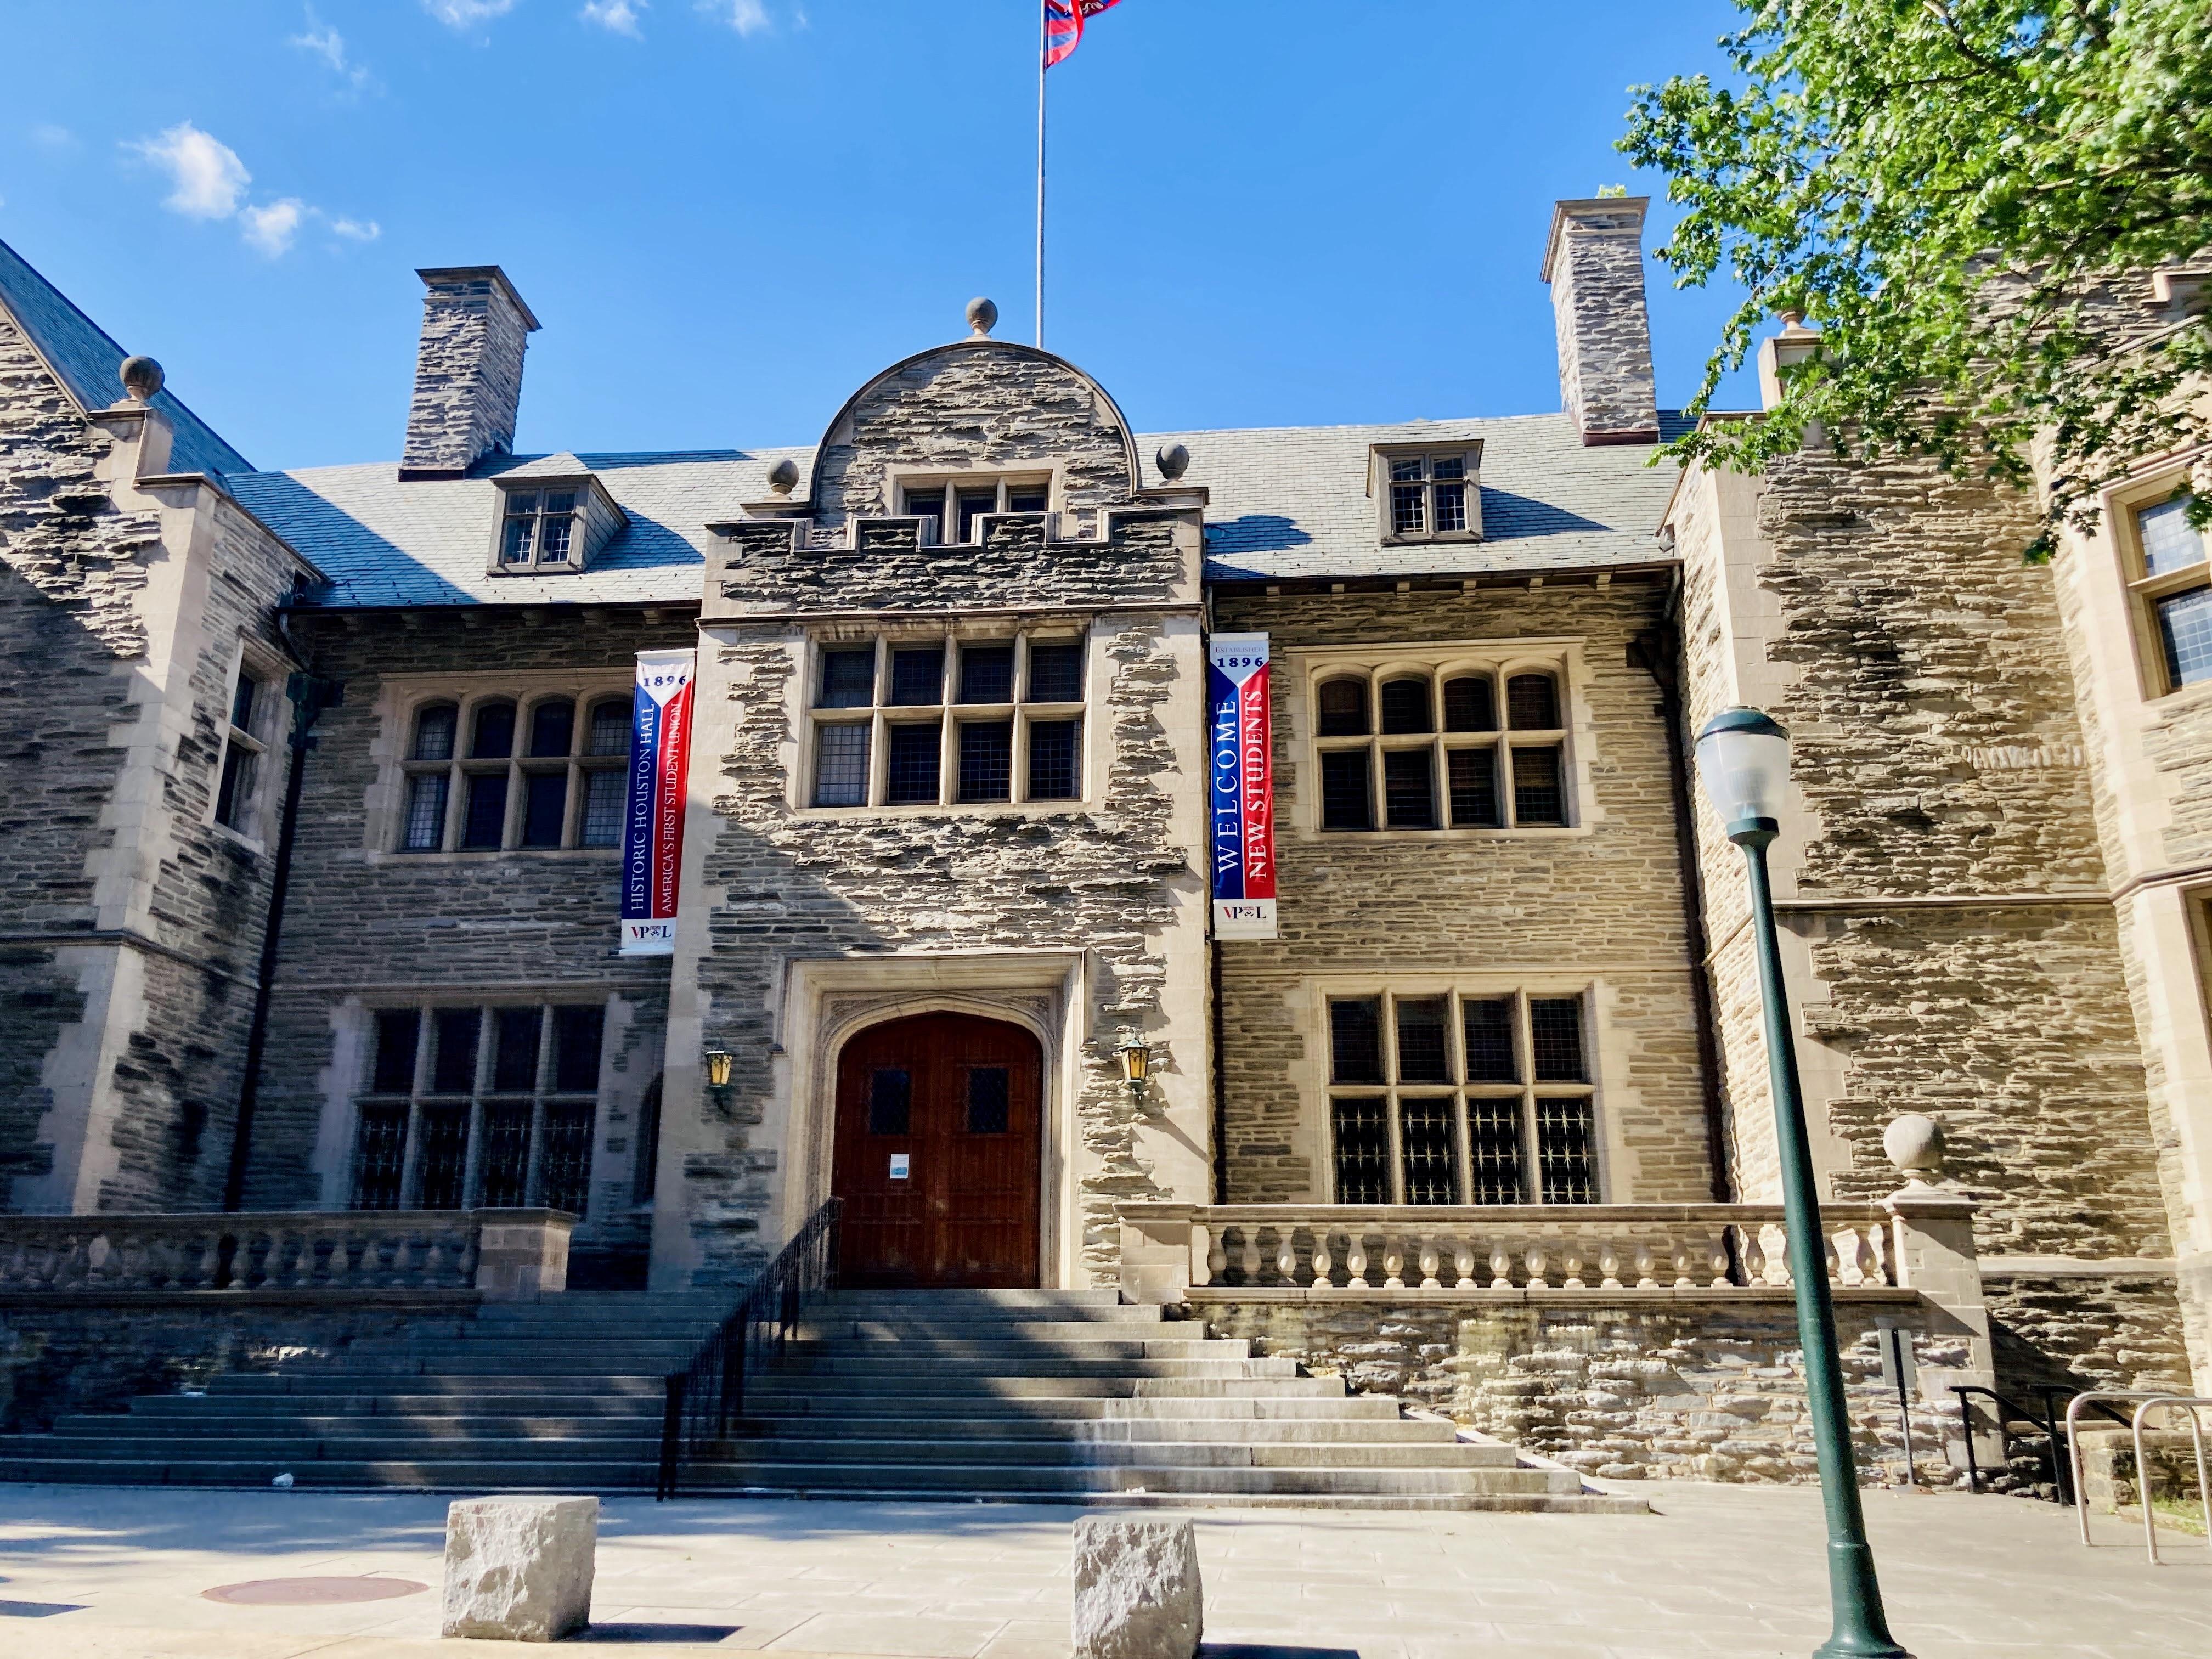 Penn Campus in University City